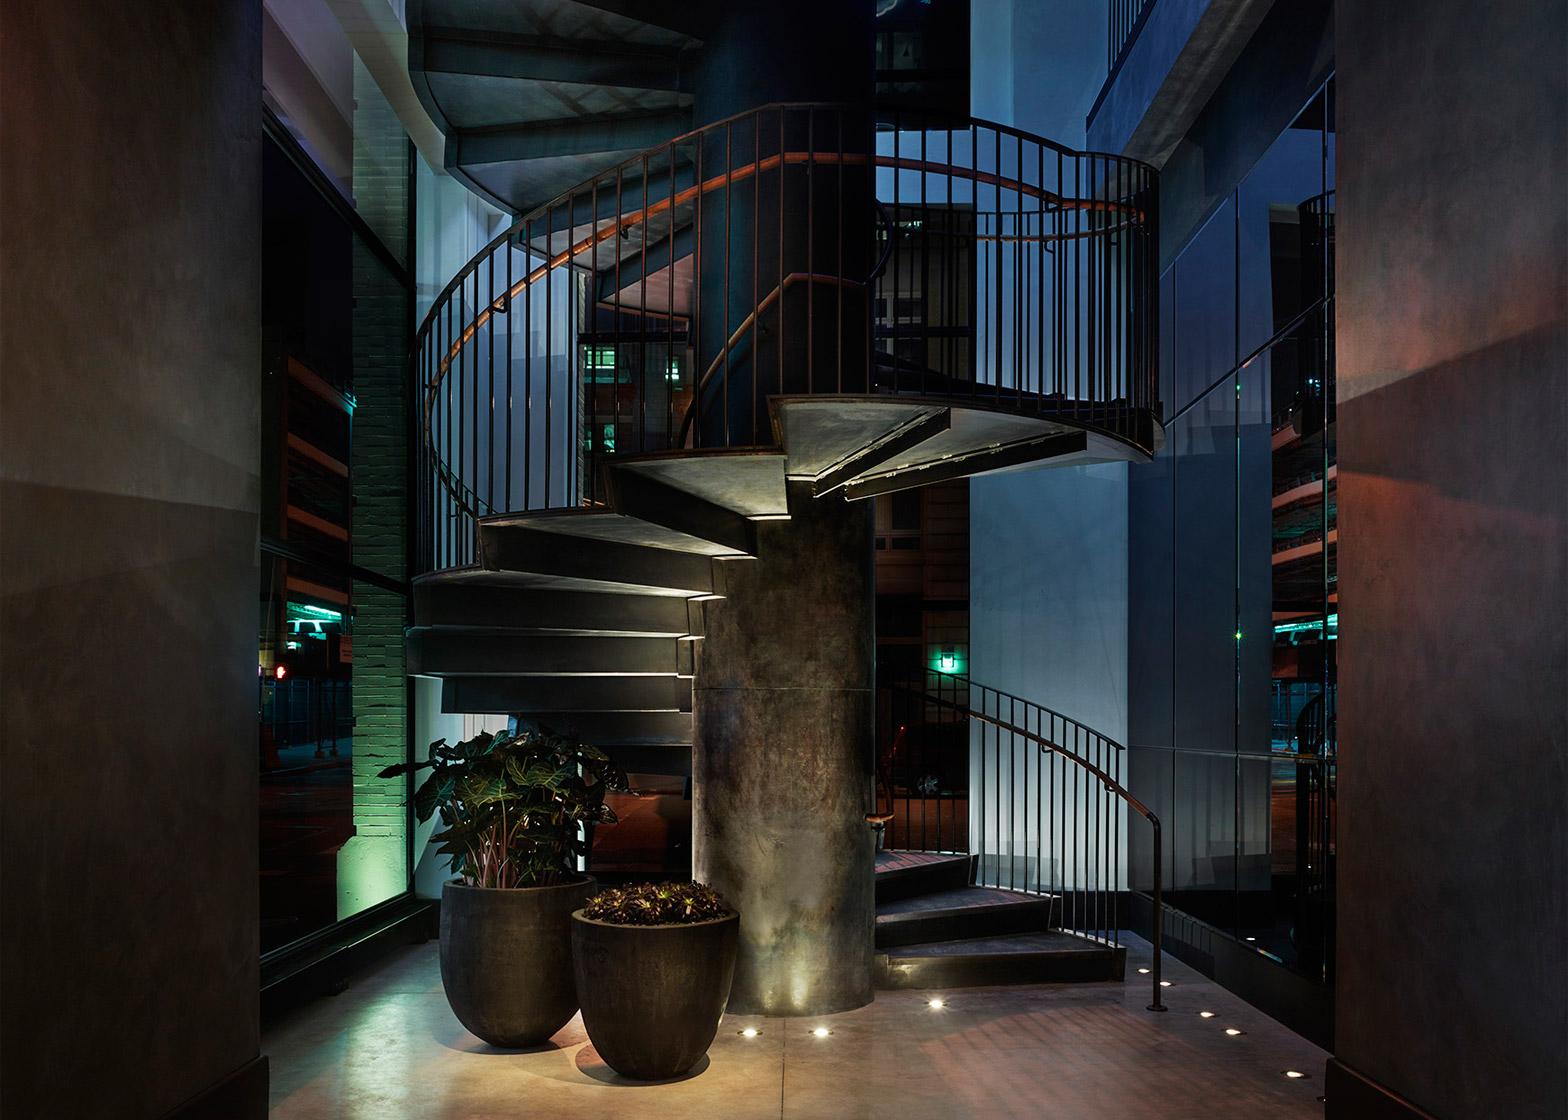 11-howard-space-copenhagen-hotel-interior-new-york-city-soho-usa_dezeen_1568_13